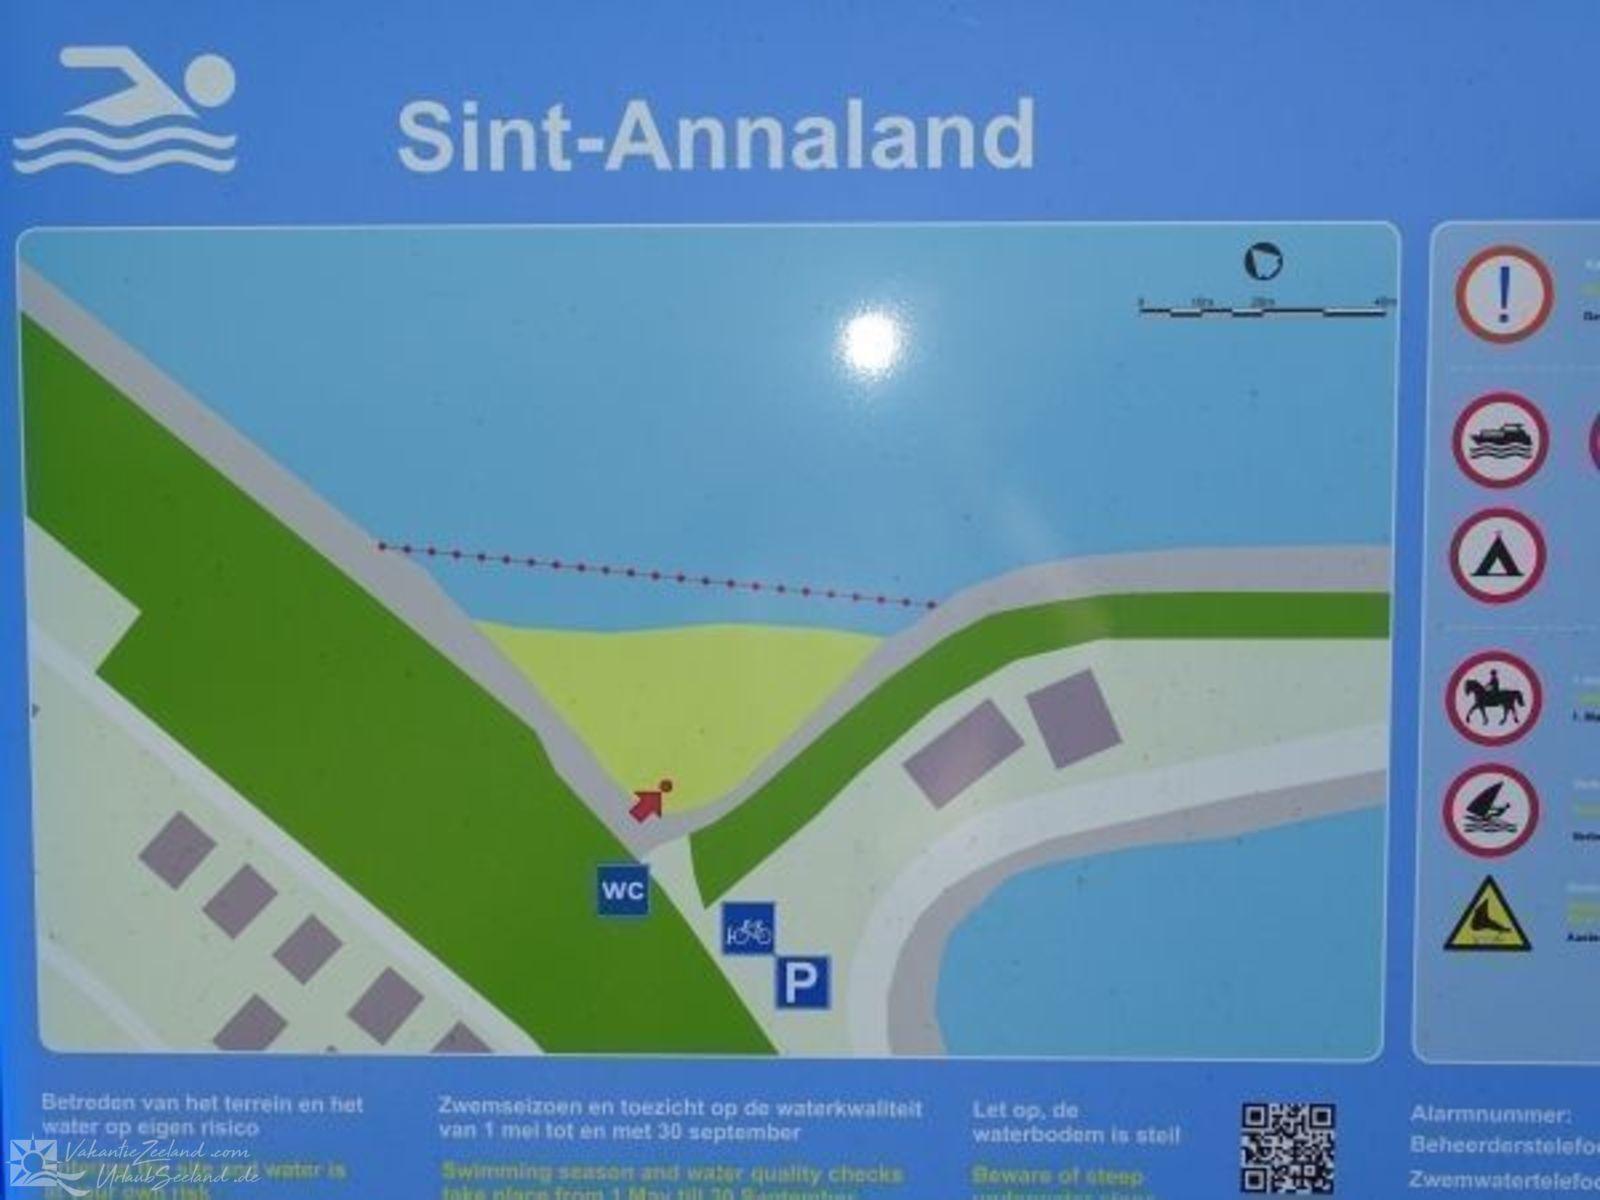 VZ476 Holiday chalet Sint-Annaland